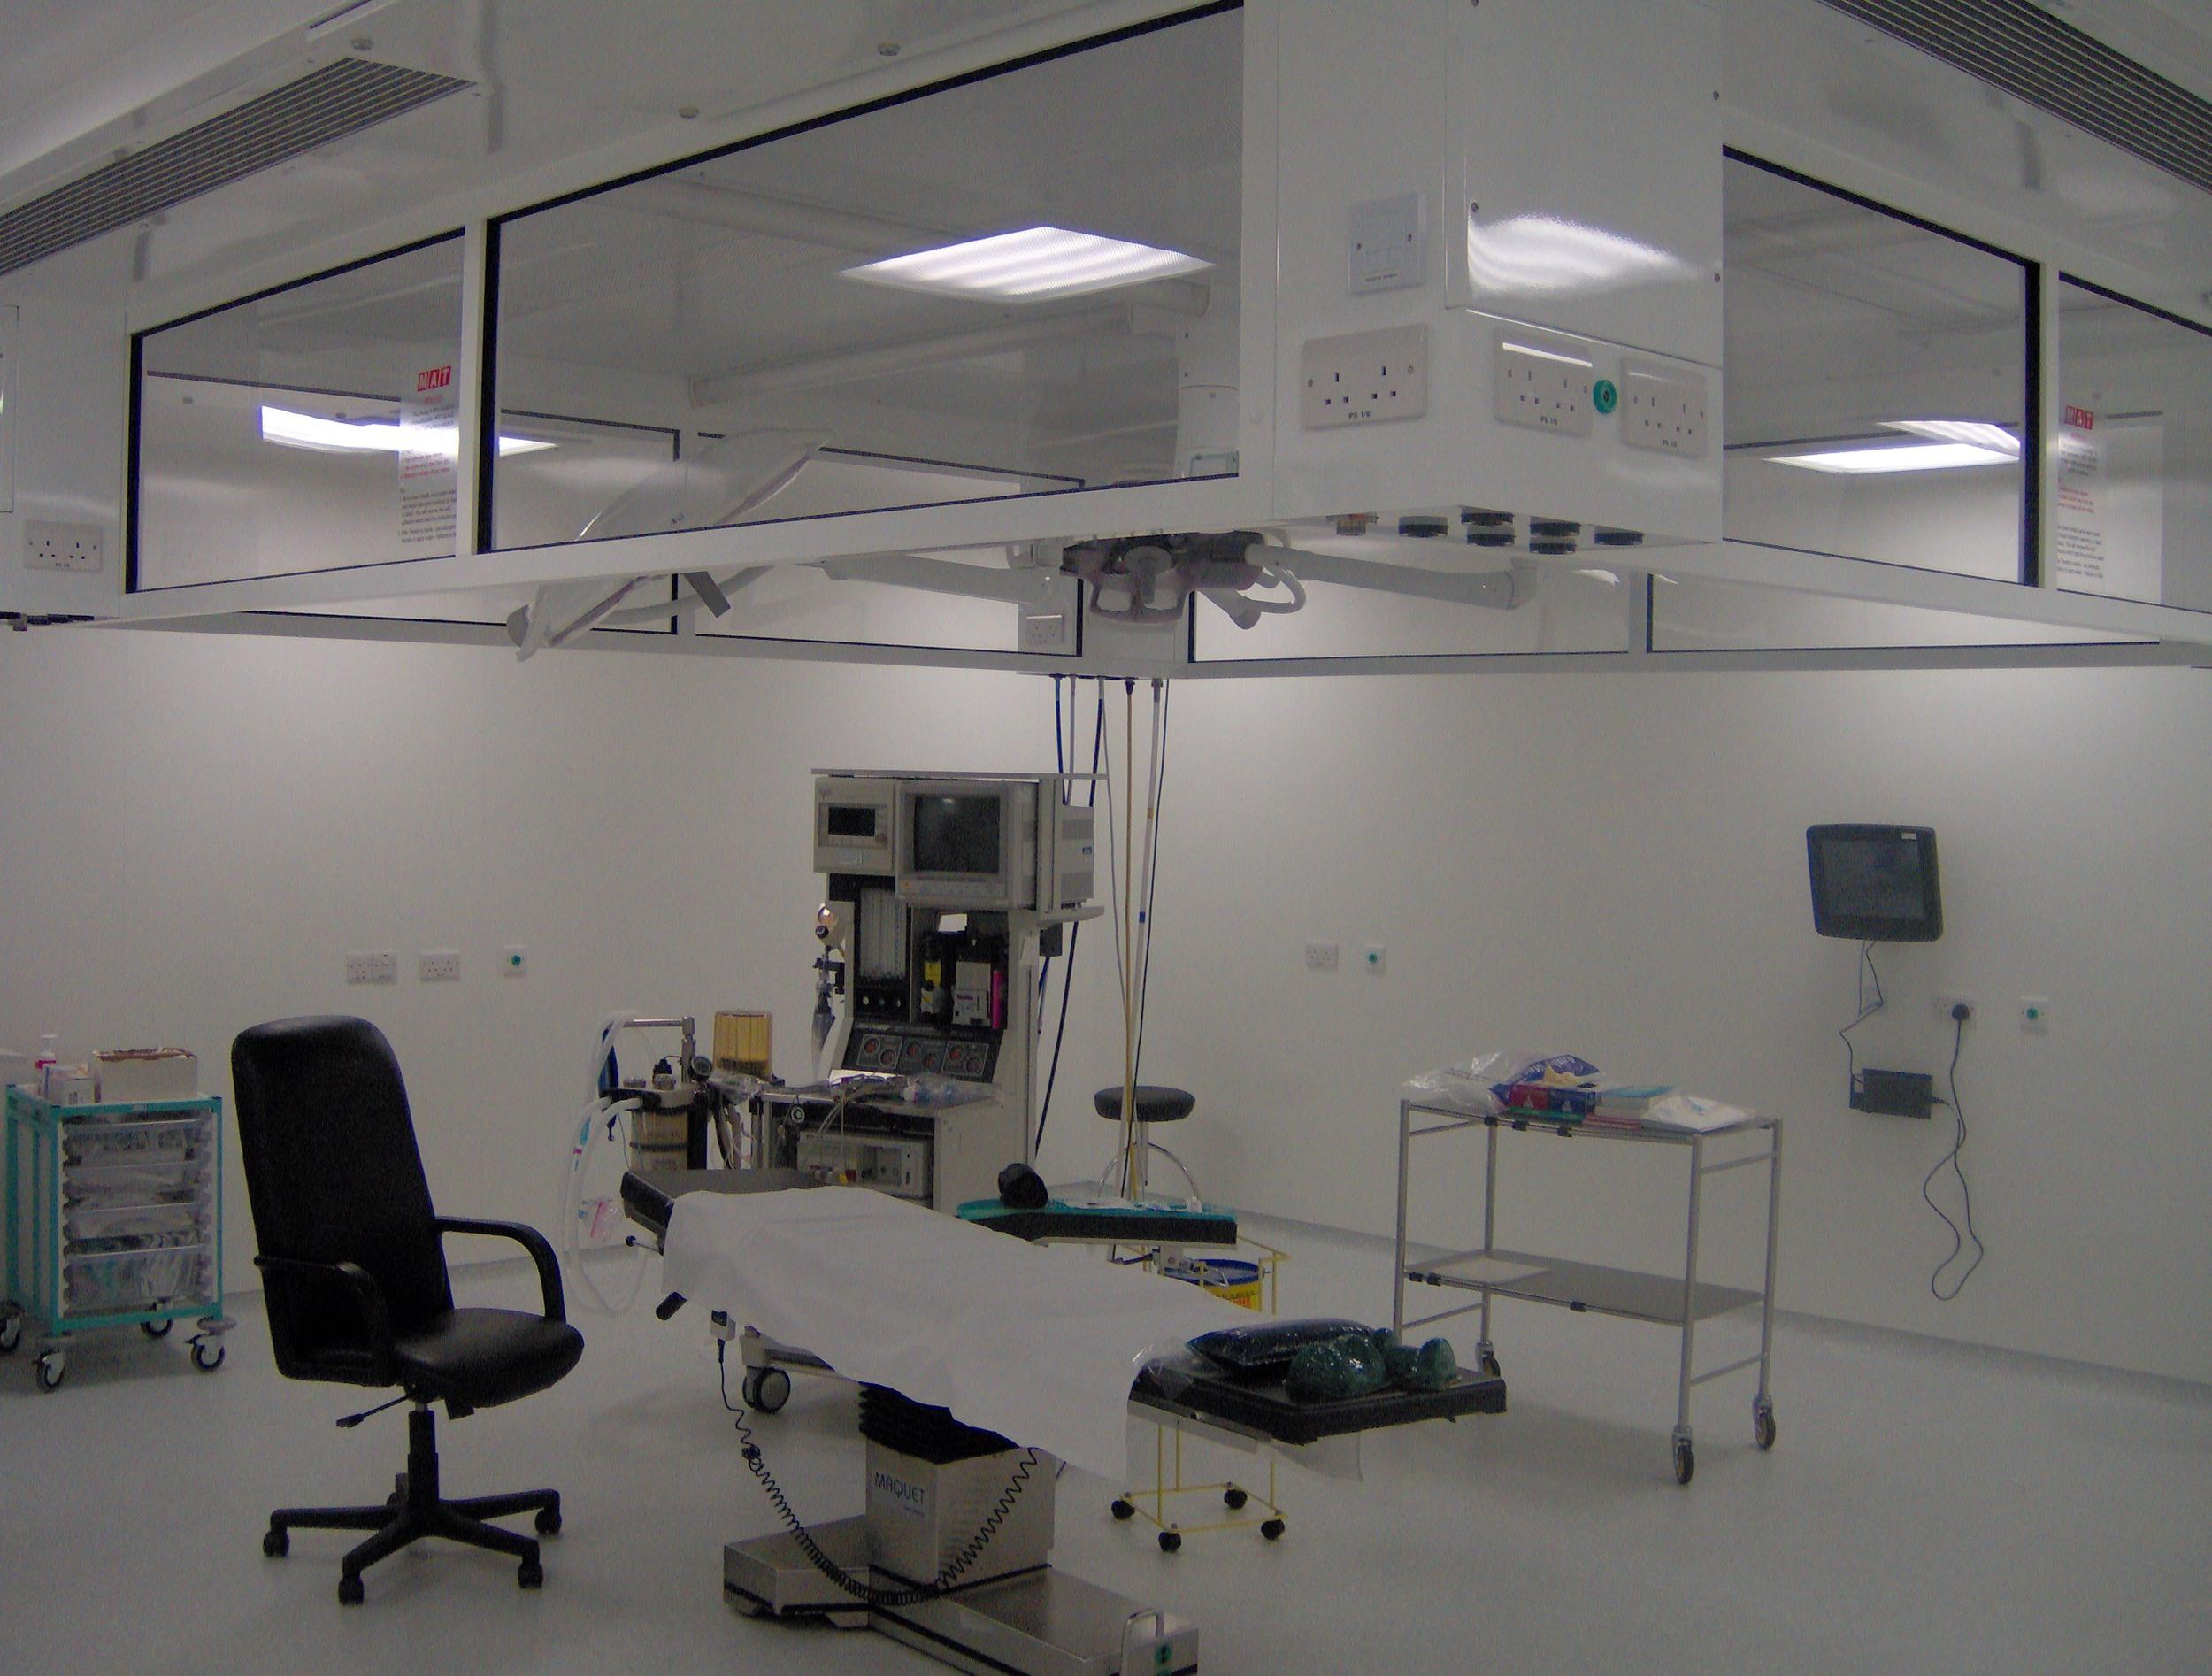 downe-hospital-1.JPG